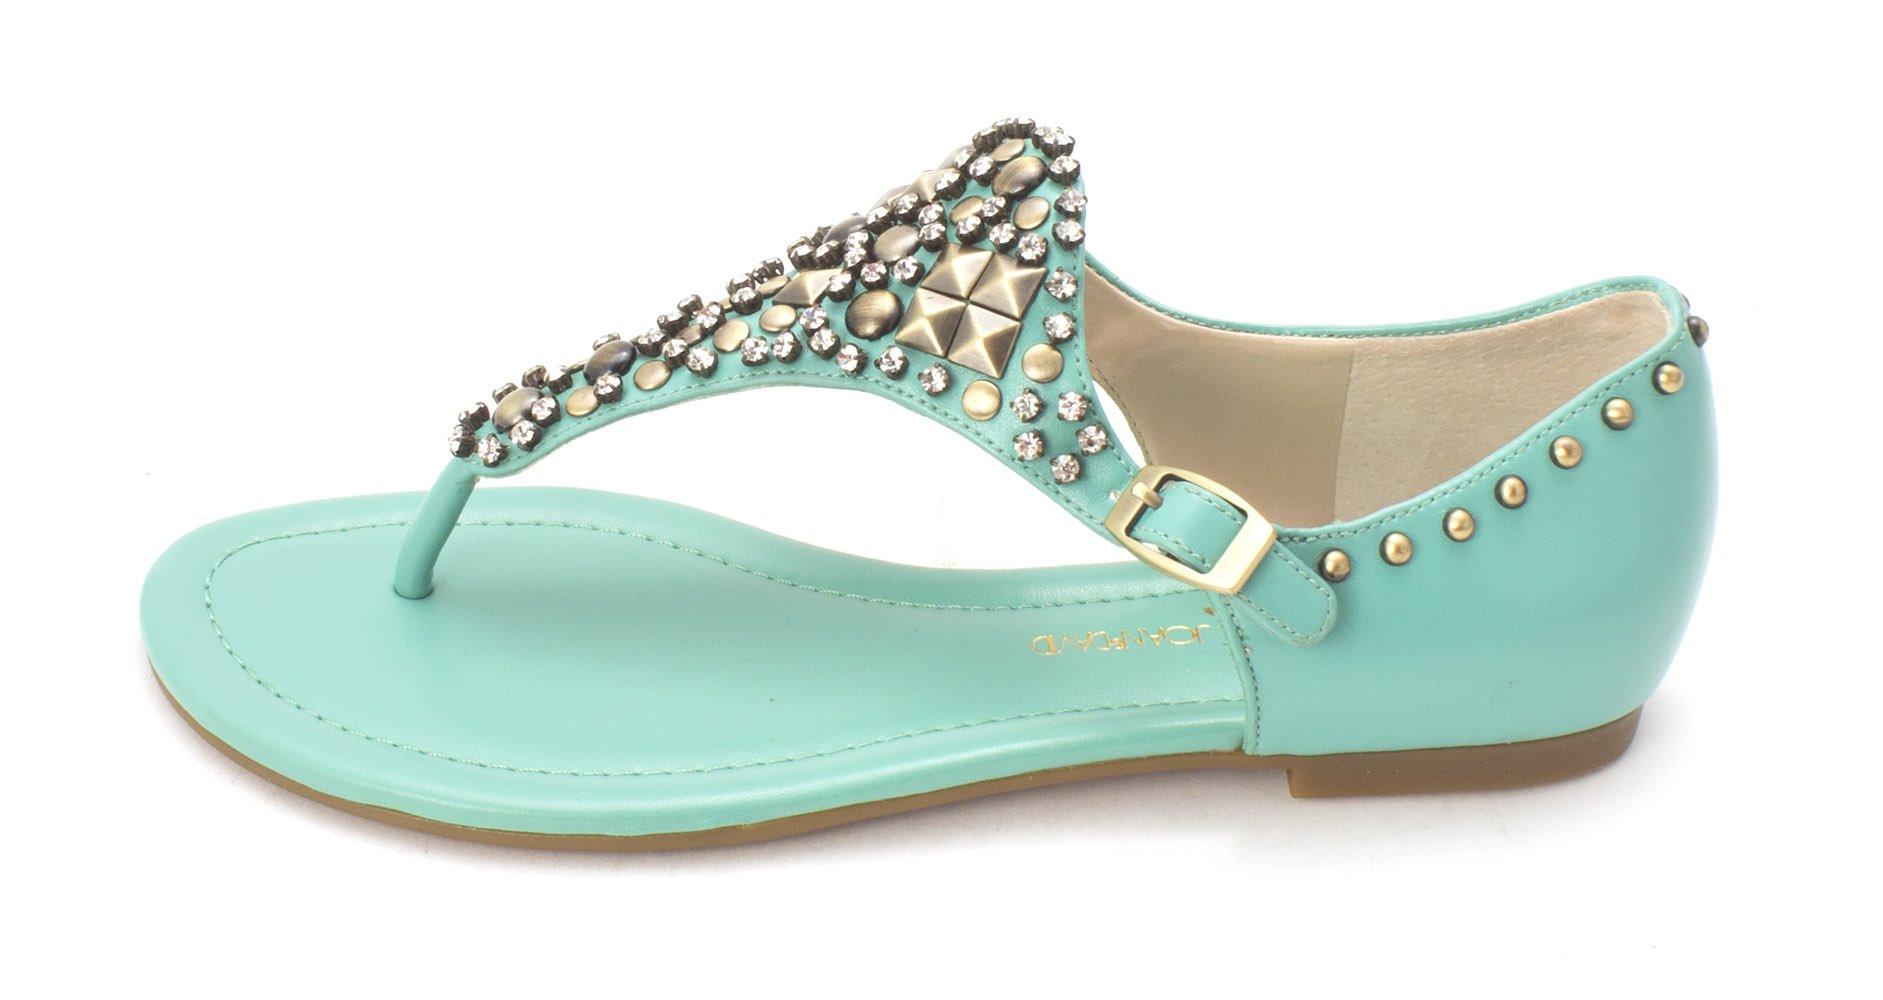 Circa Joan & David Kaycia Women's Sandals & Flip Flops, Turquoise SY, Size 6.0